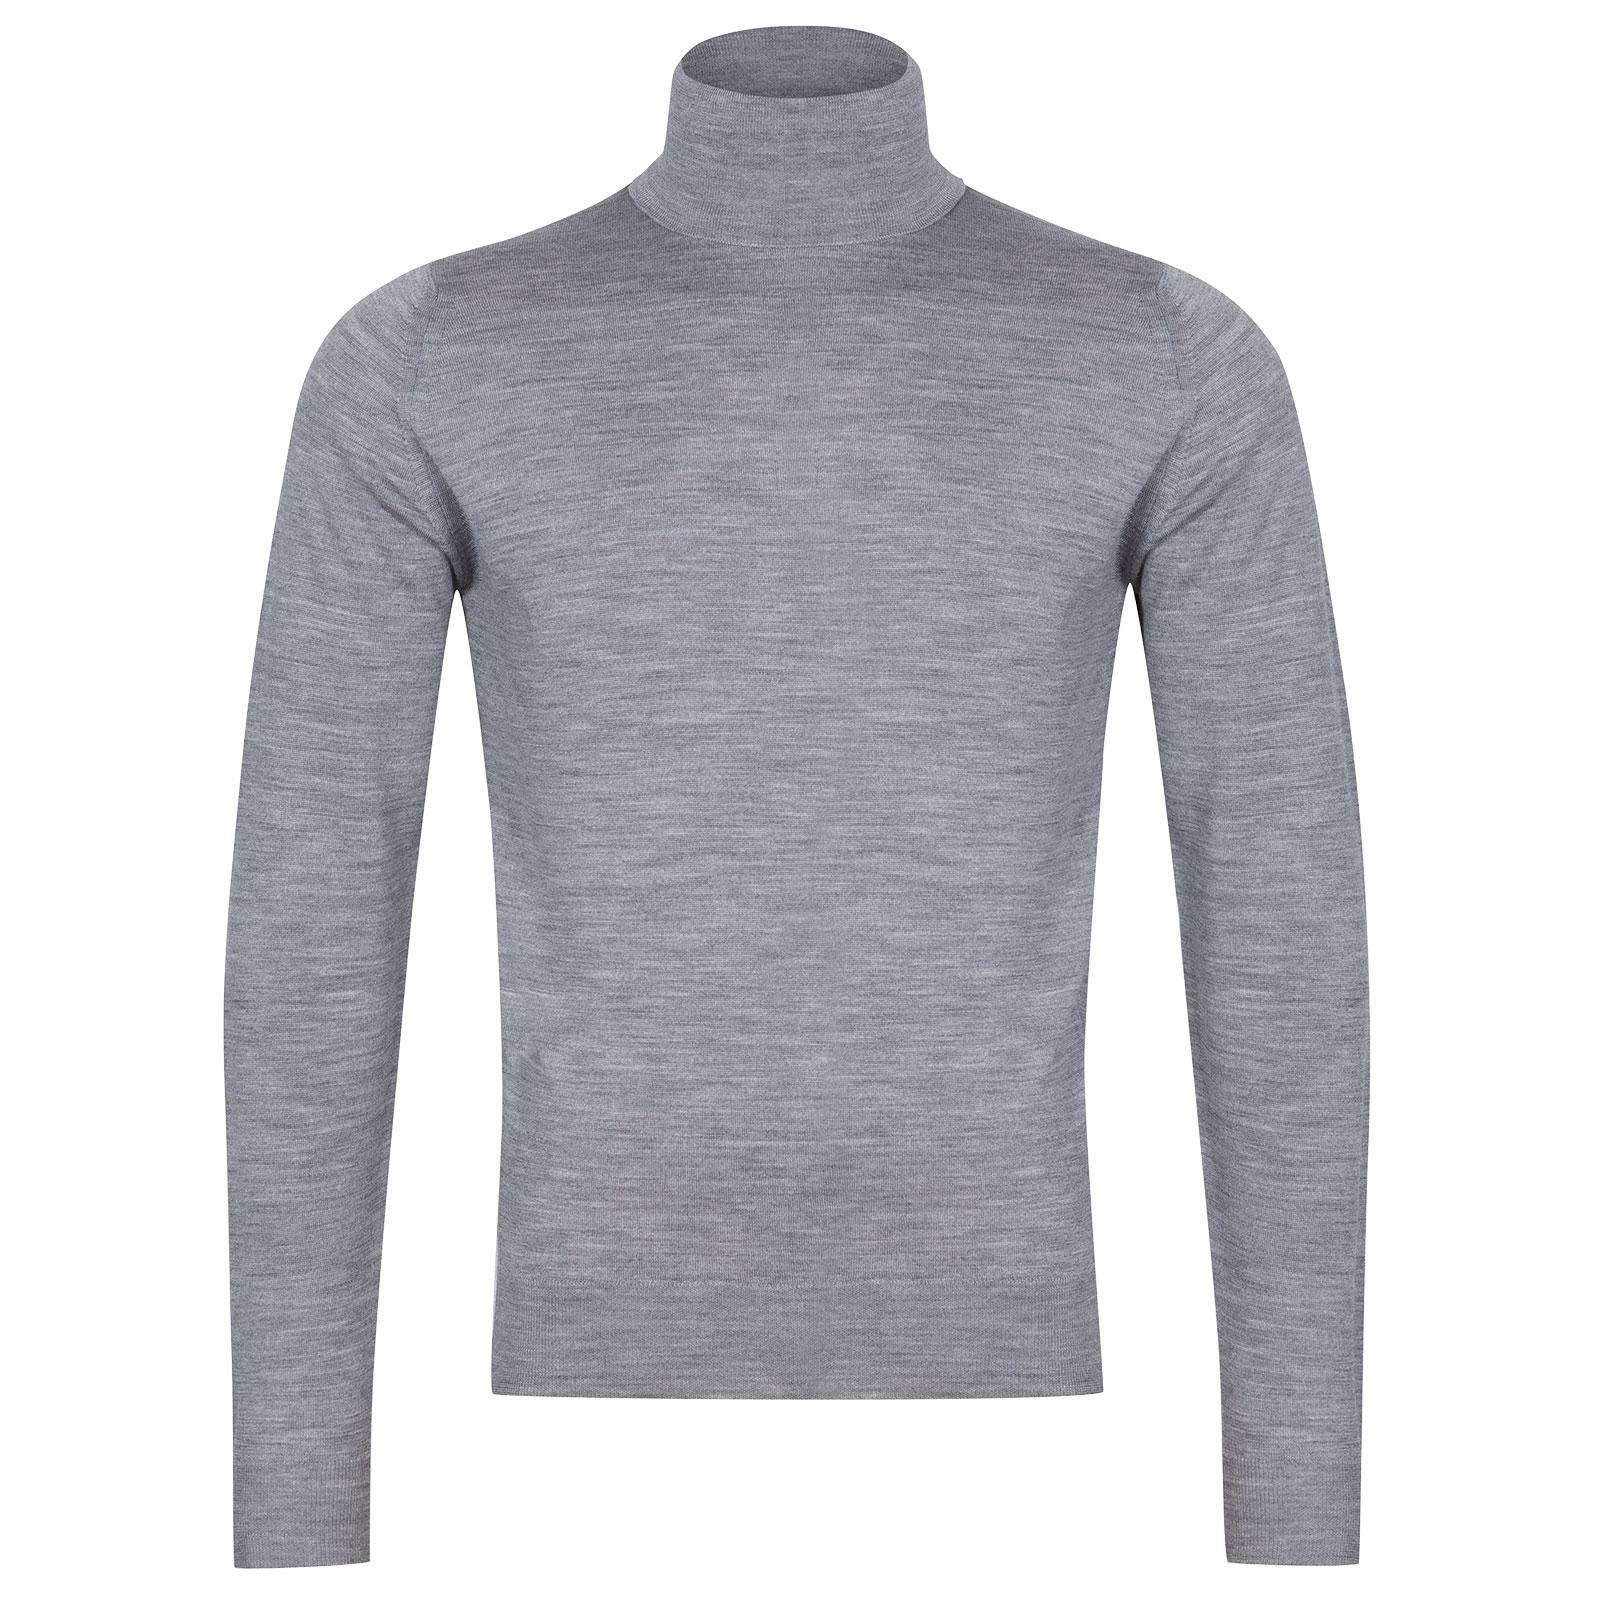 John Smedley Orta Merino Wool Pullover in Silver-XL